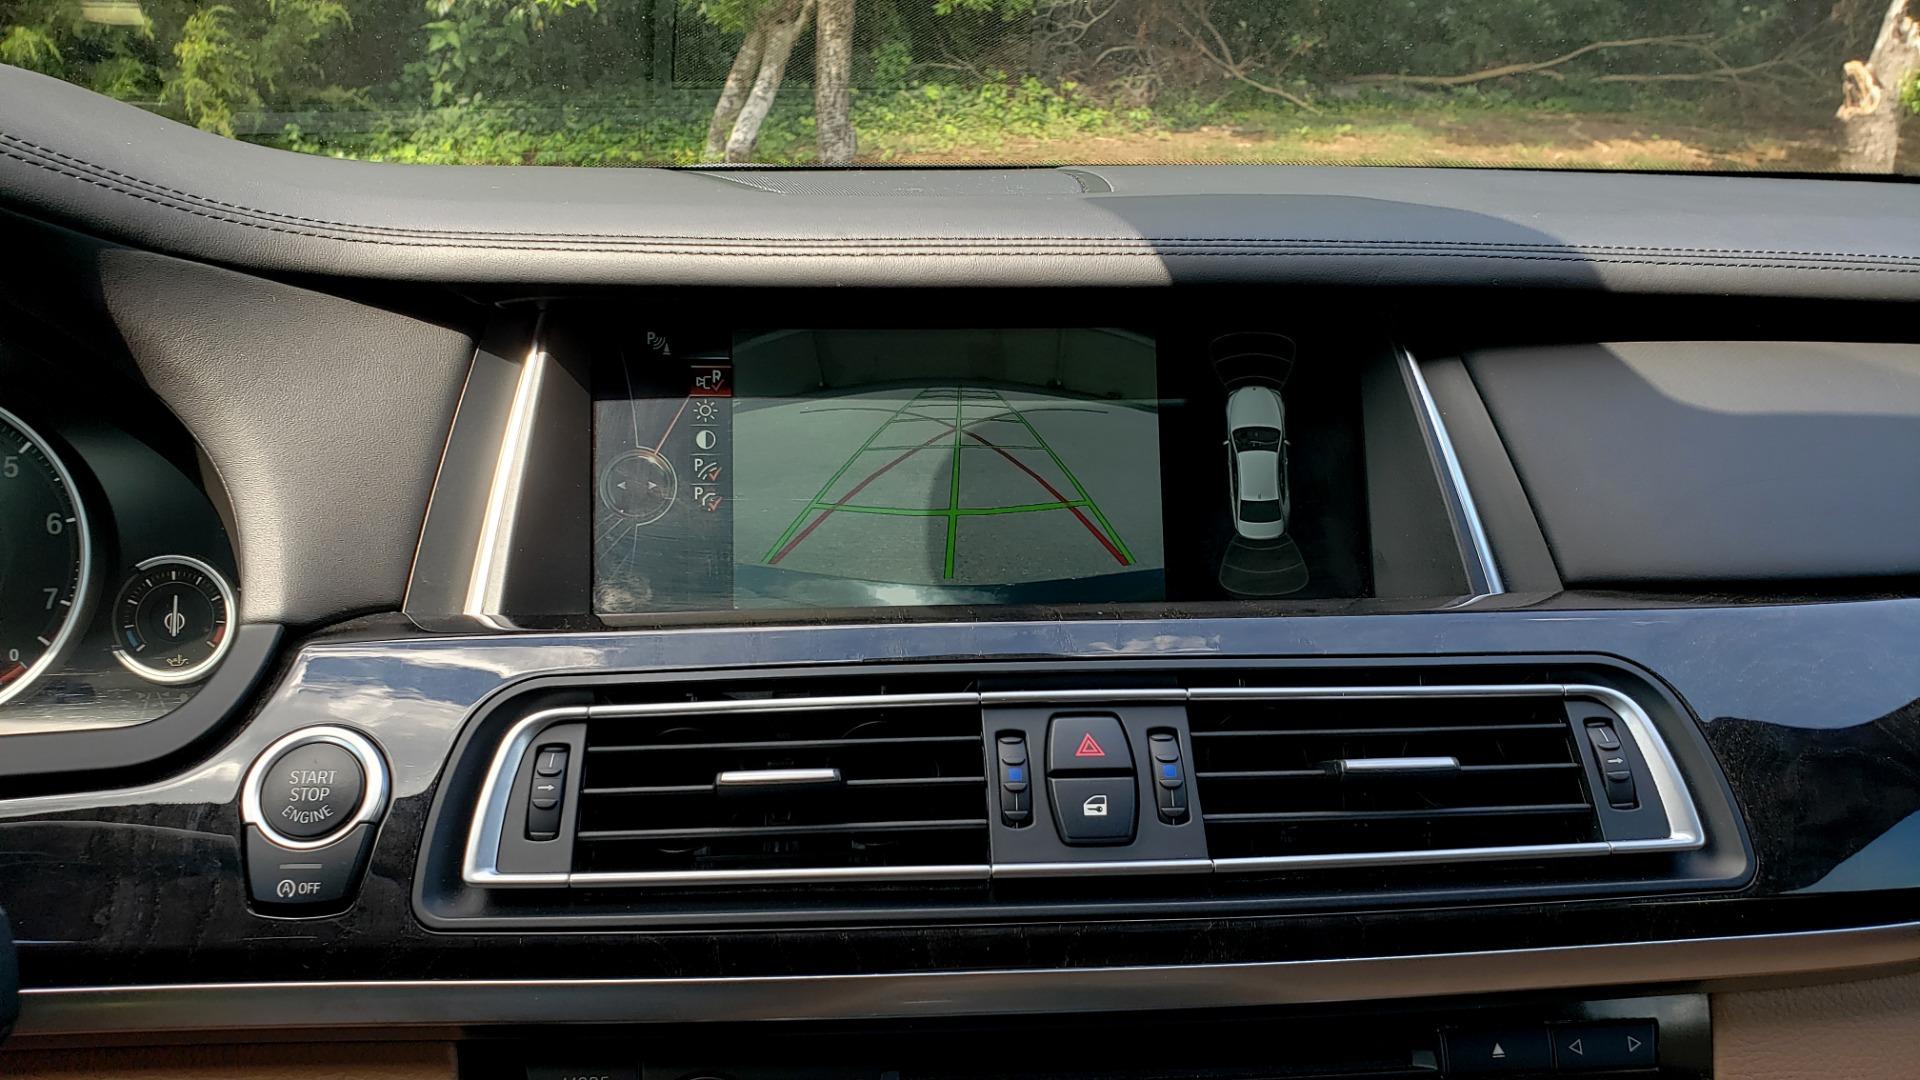 Used 2014 BMW 7 SERIES 750LI M-SPORT / EXEC PKG / DRVR ASST / LIGHTING / NAV / SUNROOF for sale Sold at Formula Imports in Charlotte NC 28227 42